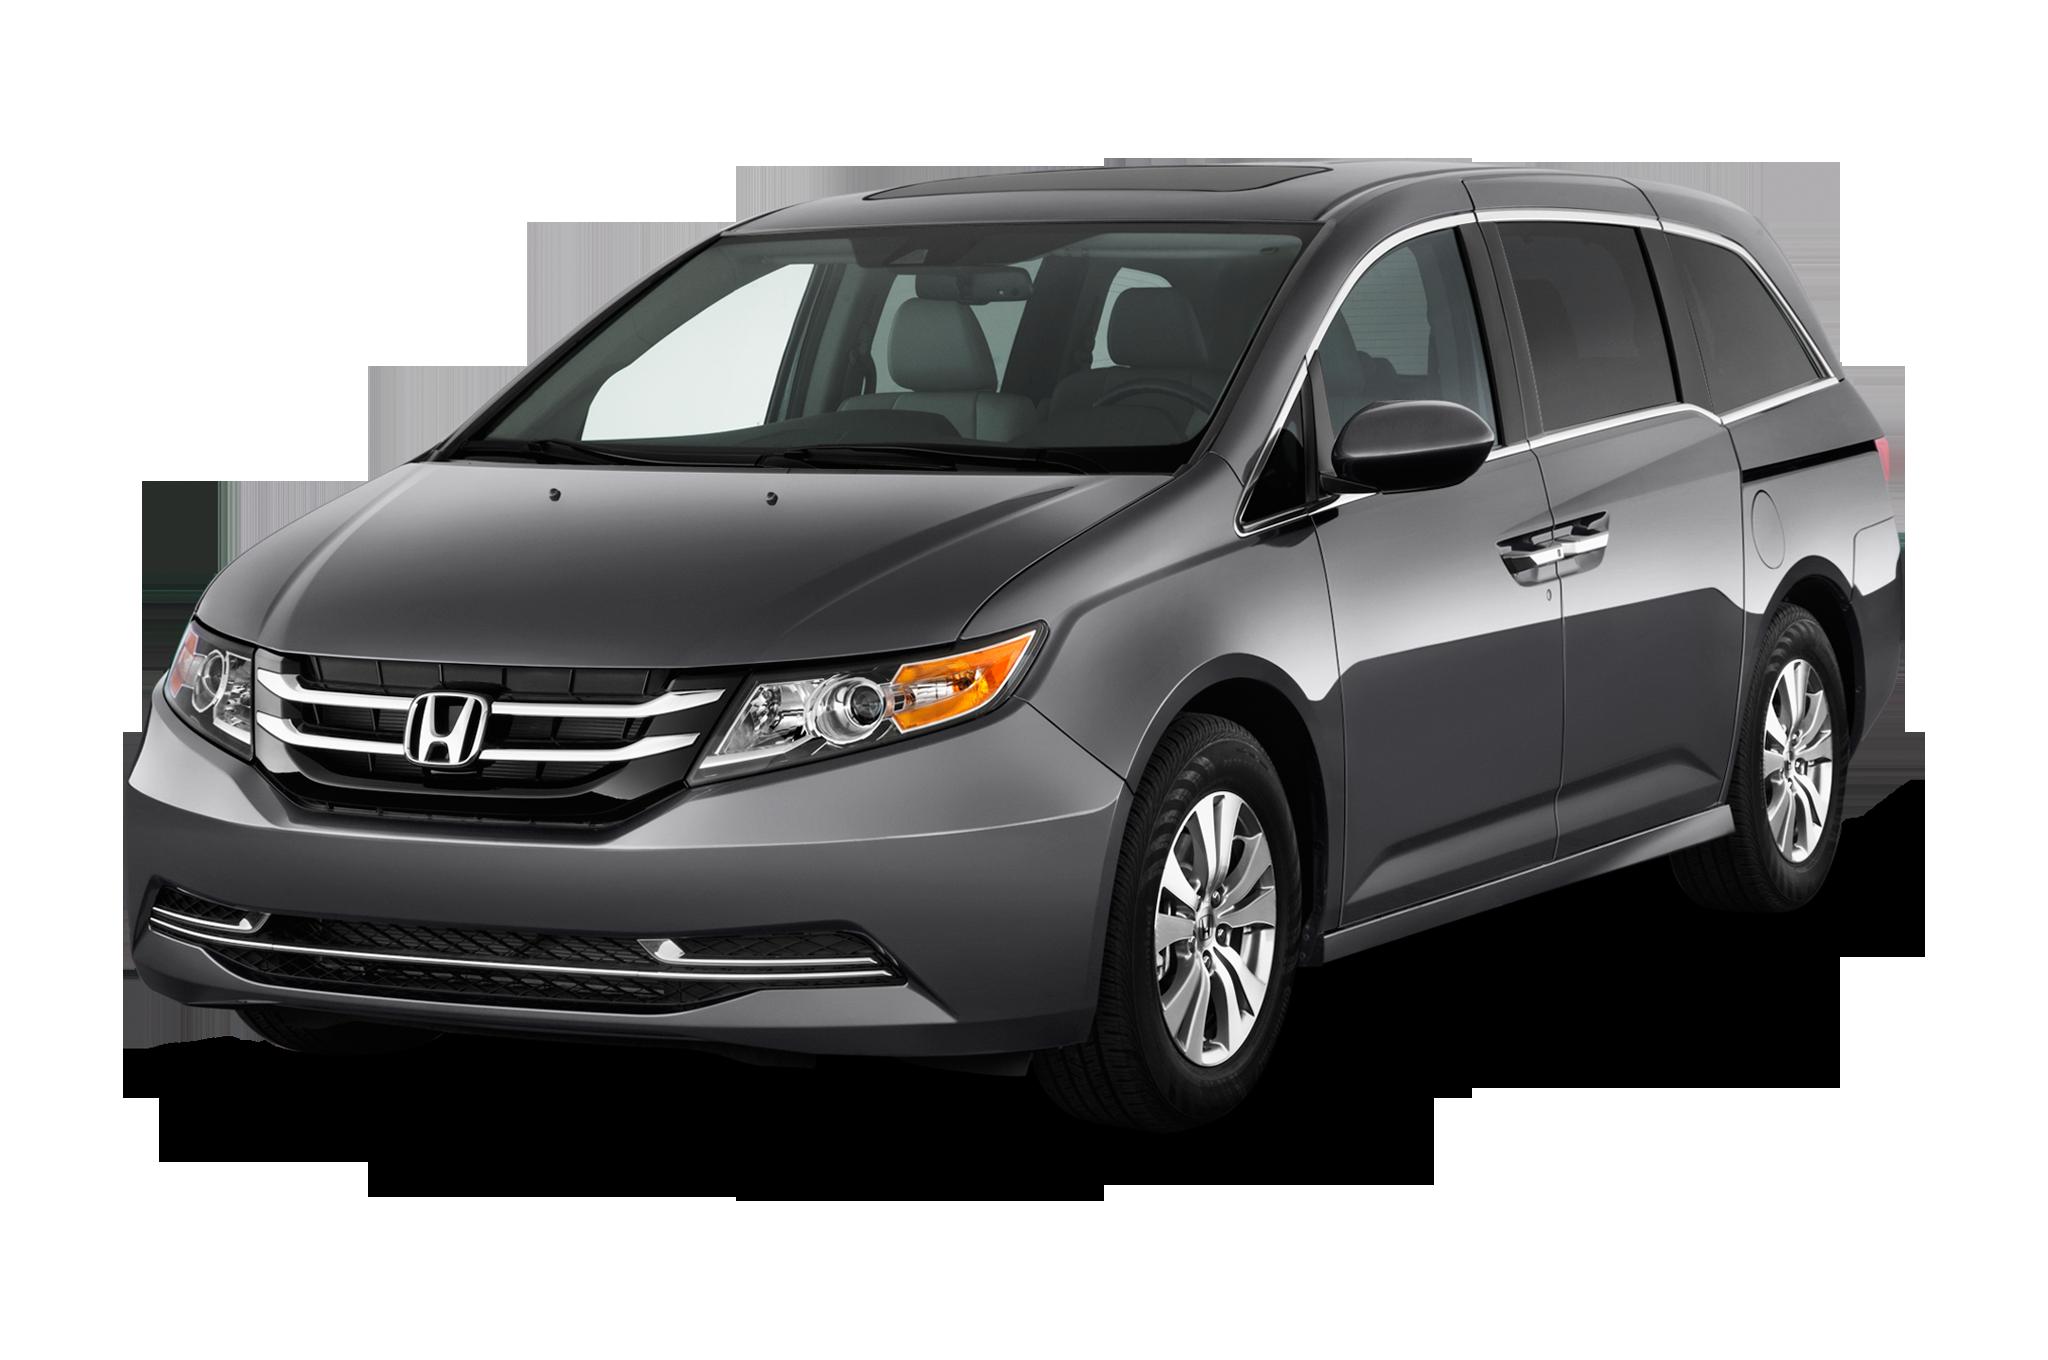 2017 Honda Odyssey Reviews.